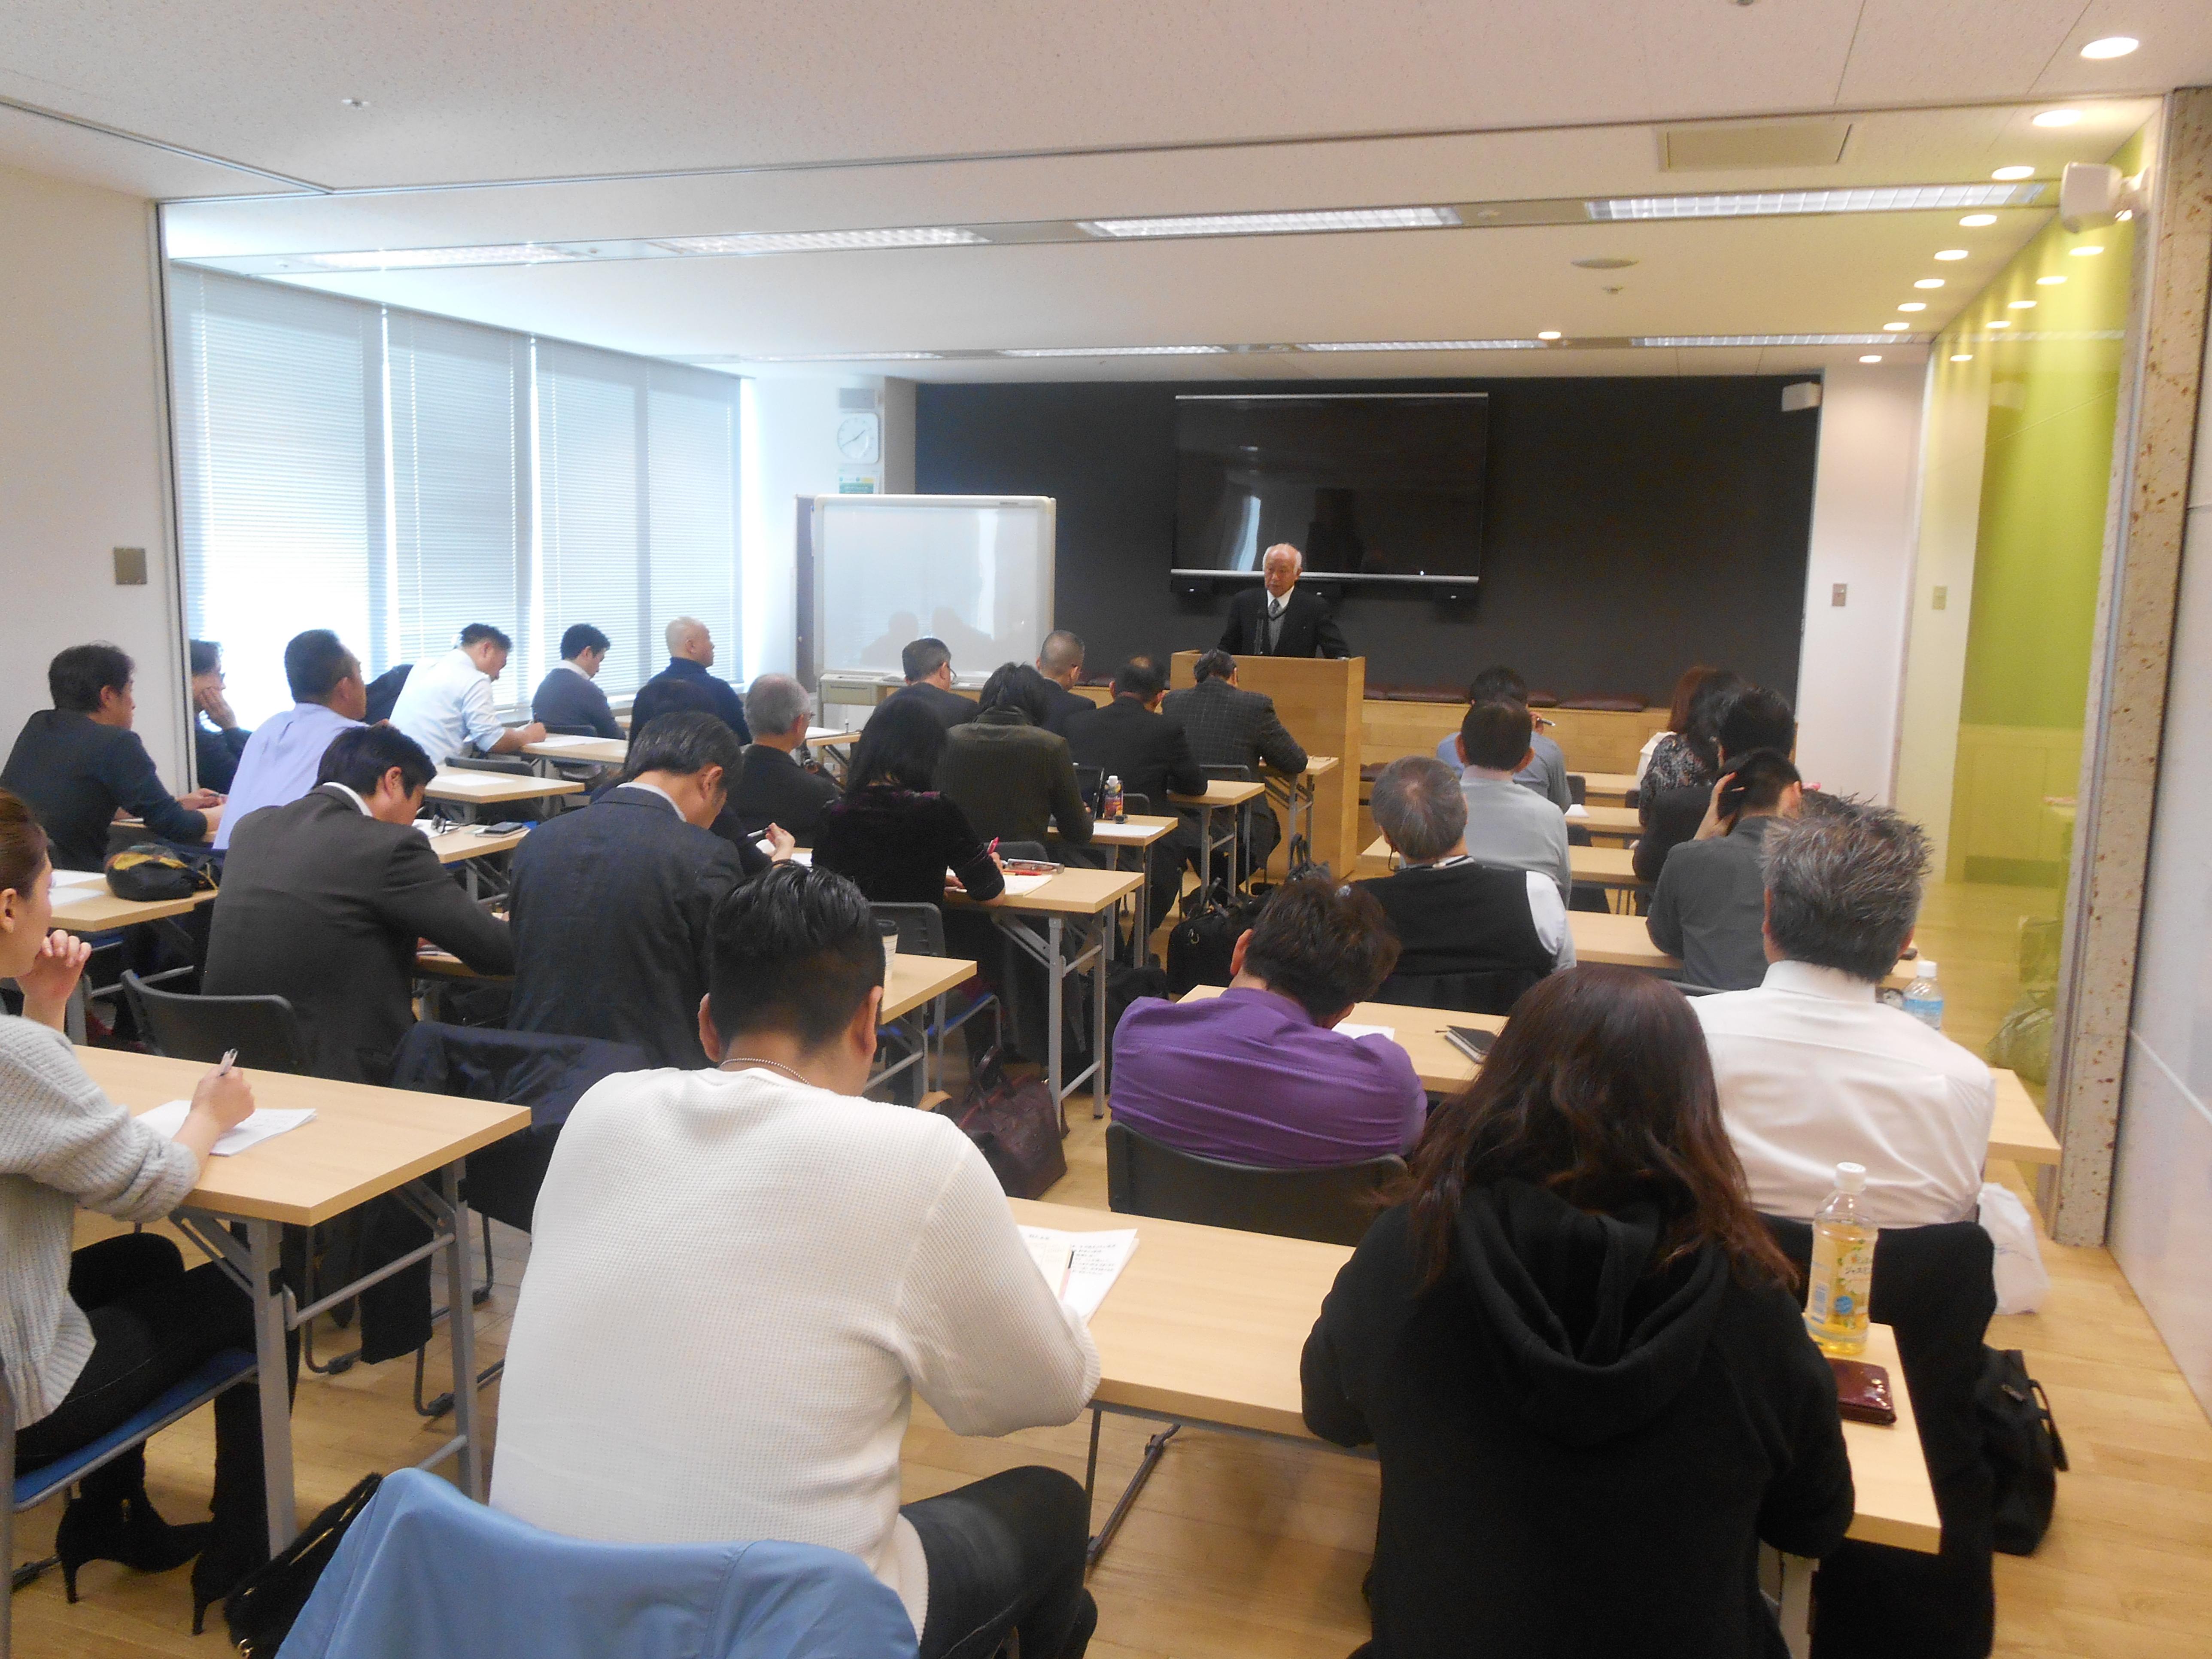 DSCN0039 1 - 平成30年度 東京思風塾 4月7日(土)「時代が問題をつくり、問題が人物をつくる」